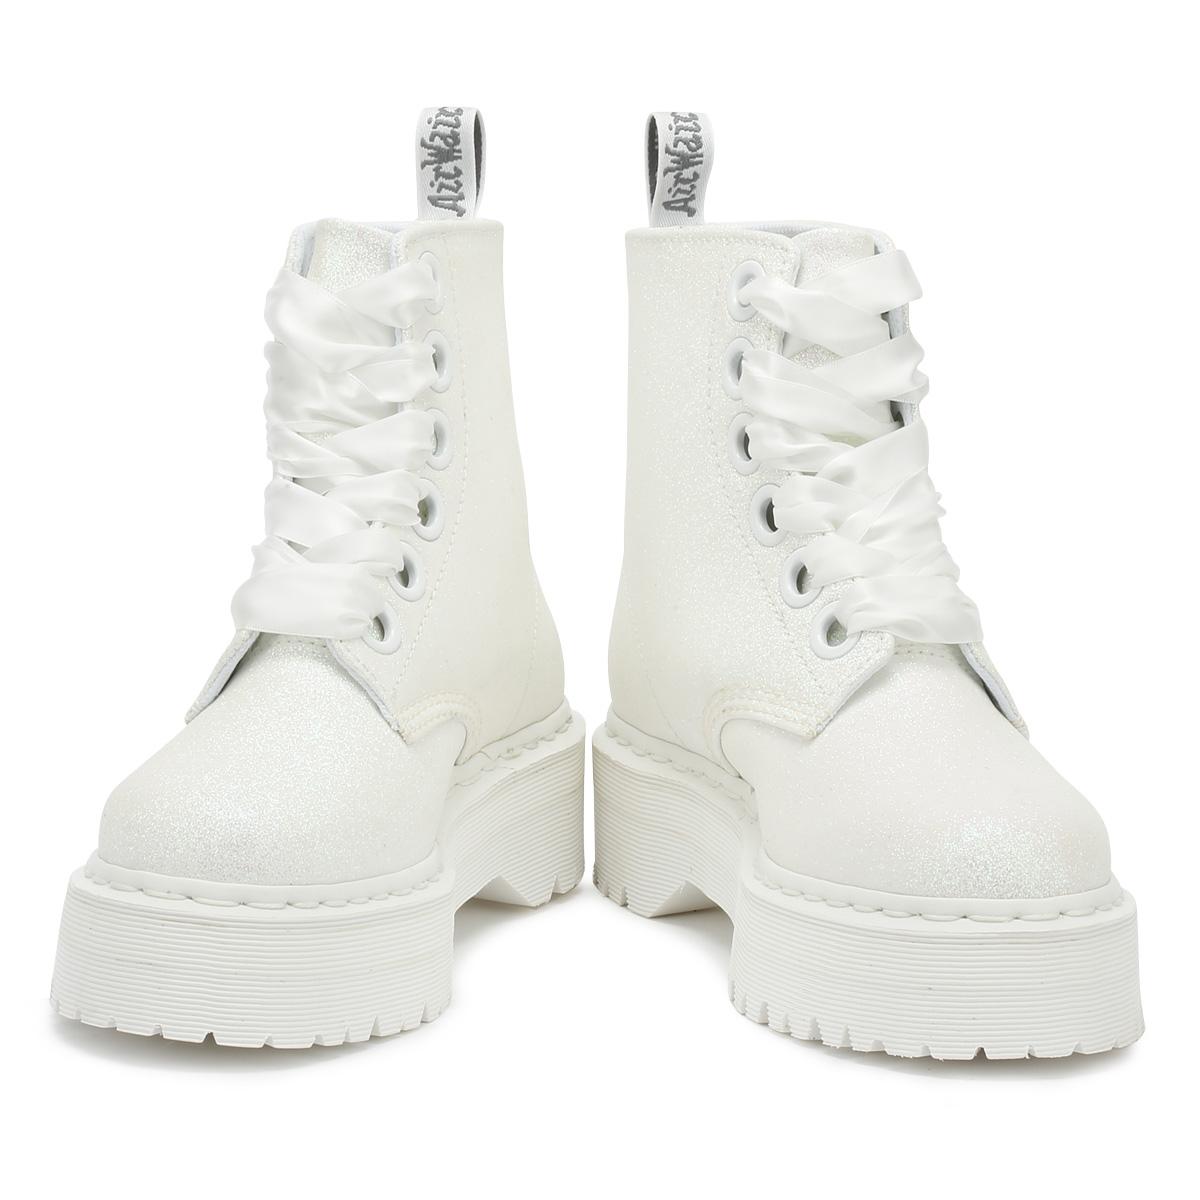 b94fcfcd884f Dr. Martens Molly Womens Boots Iridescent White Glitter Warm Winter ...